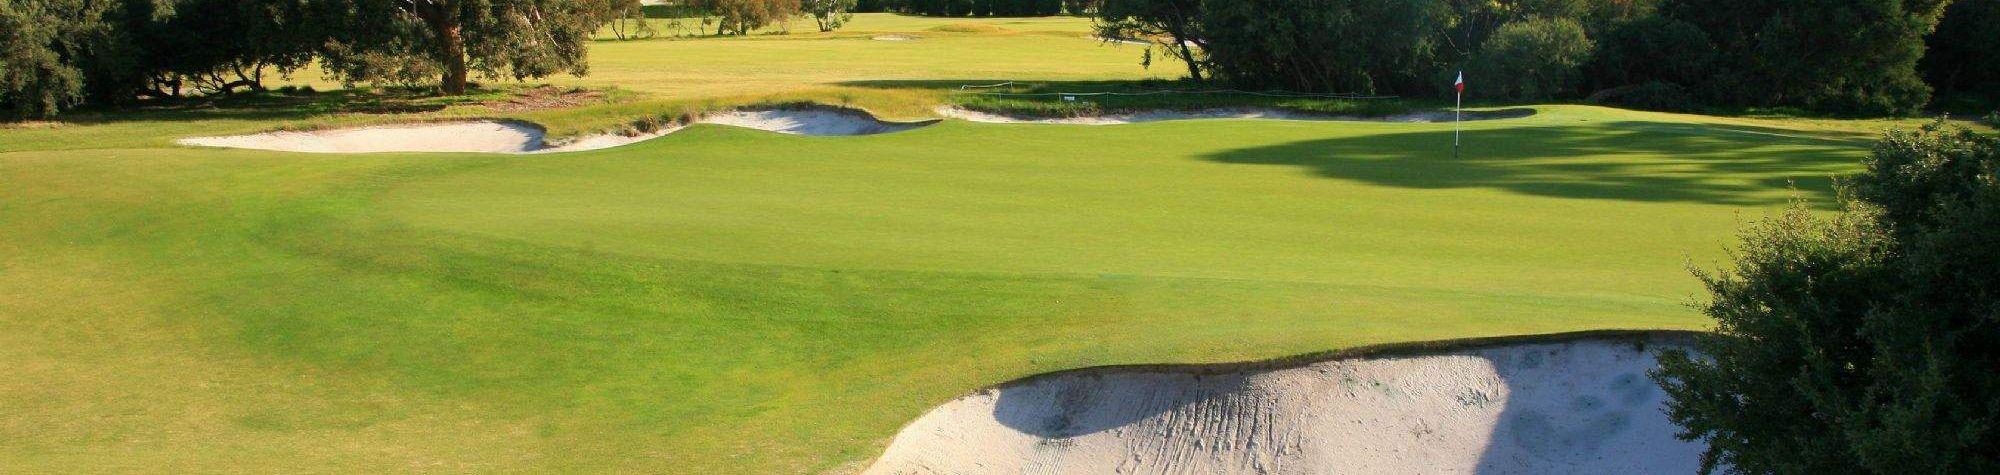 Royal Melbourne Golf Club East Course